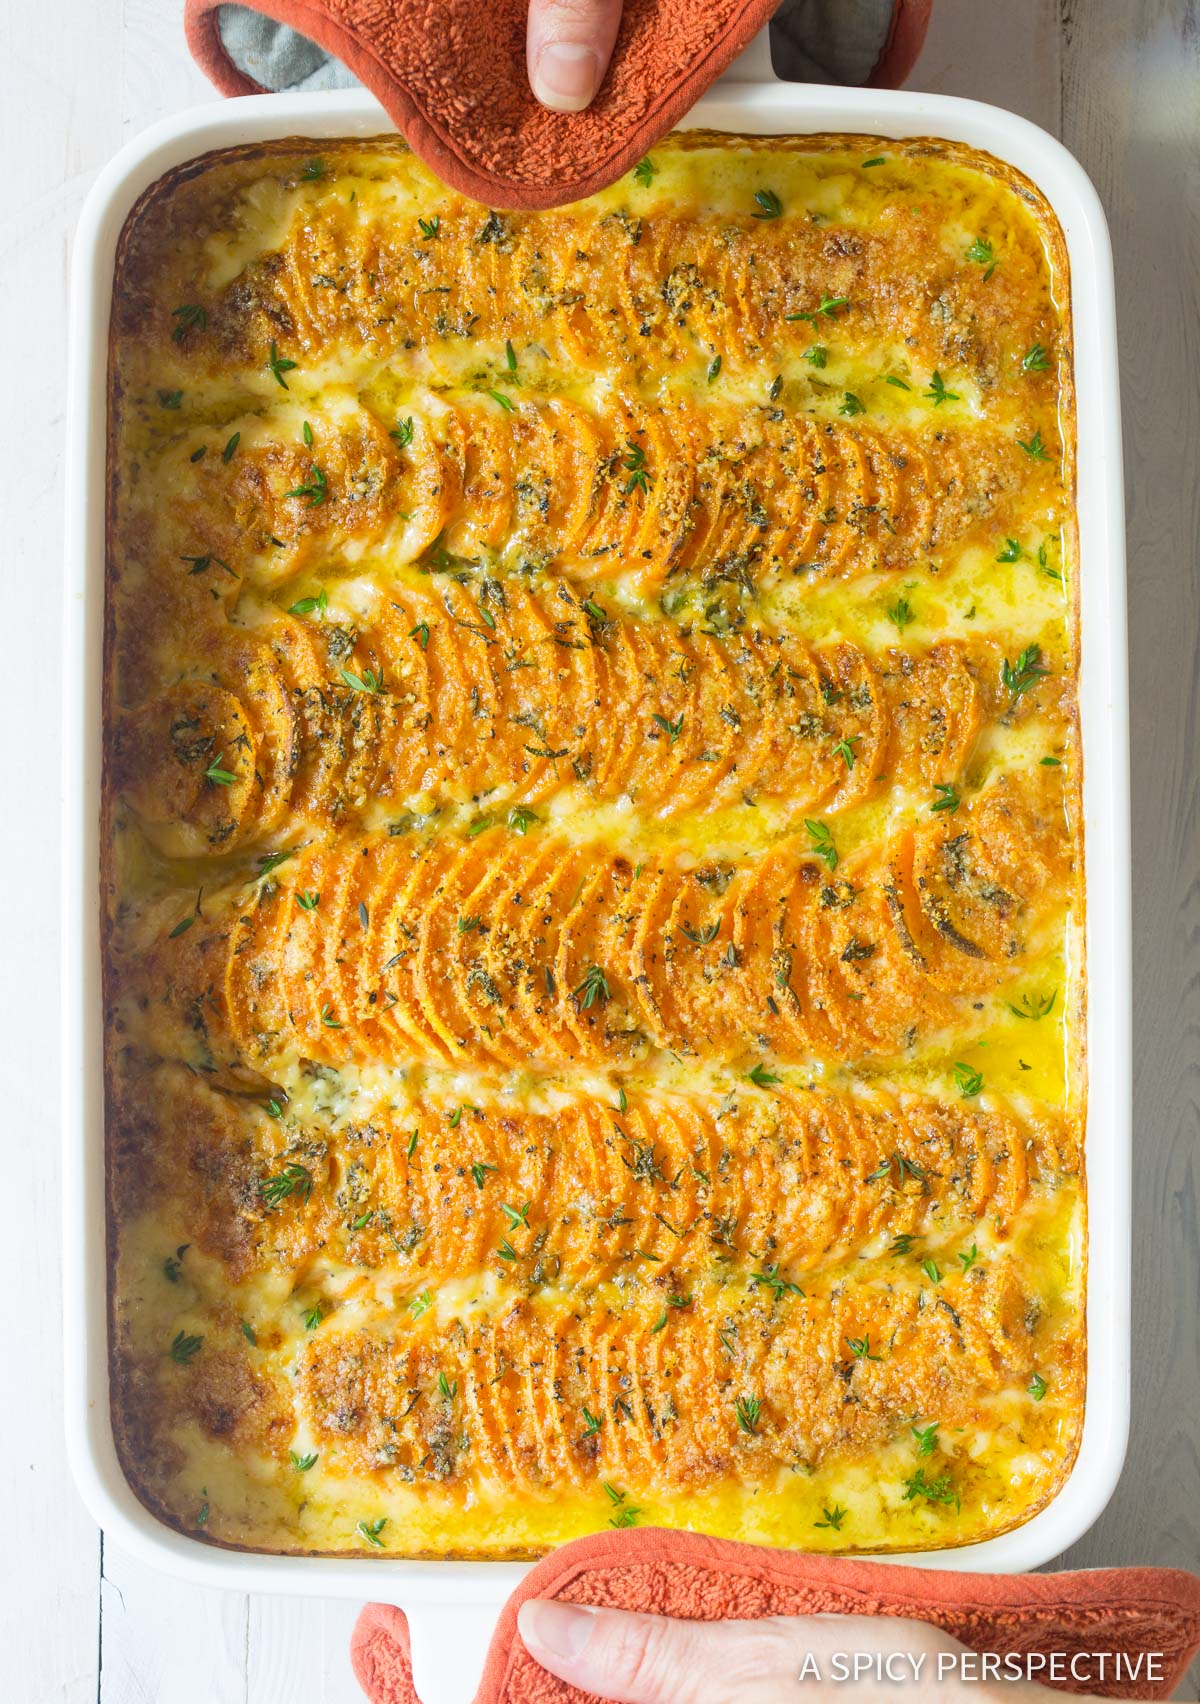 The Best Garlic Butter Scalloped Sweet Potatoes Recipe #ASpicyPerspective #Thanksgiving